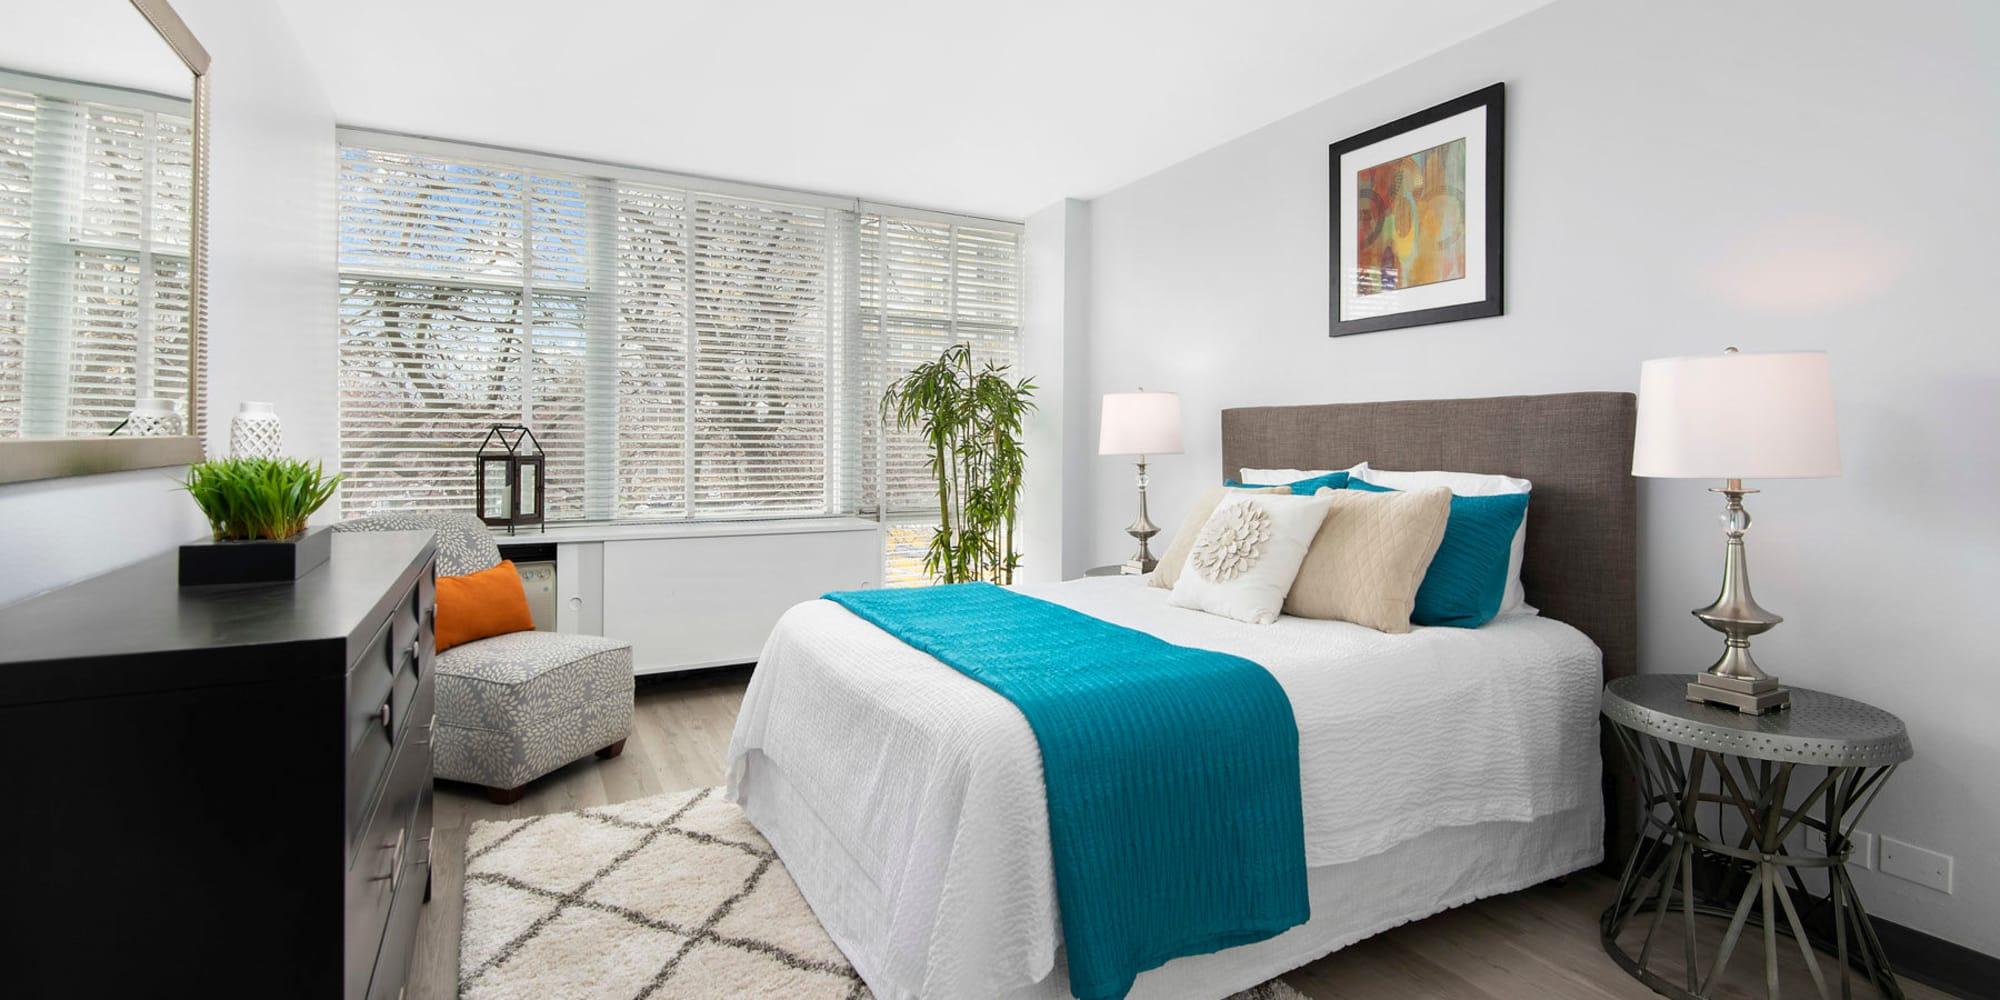 Luxury apartments in Chicago, Illinois at Prairie Shores